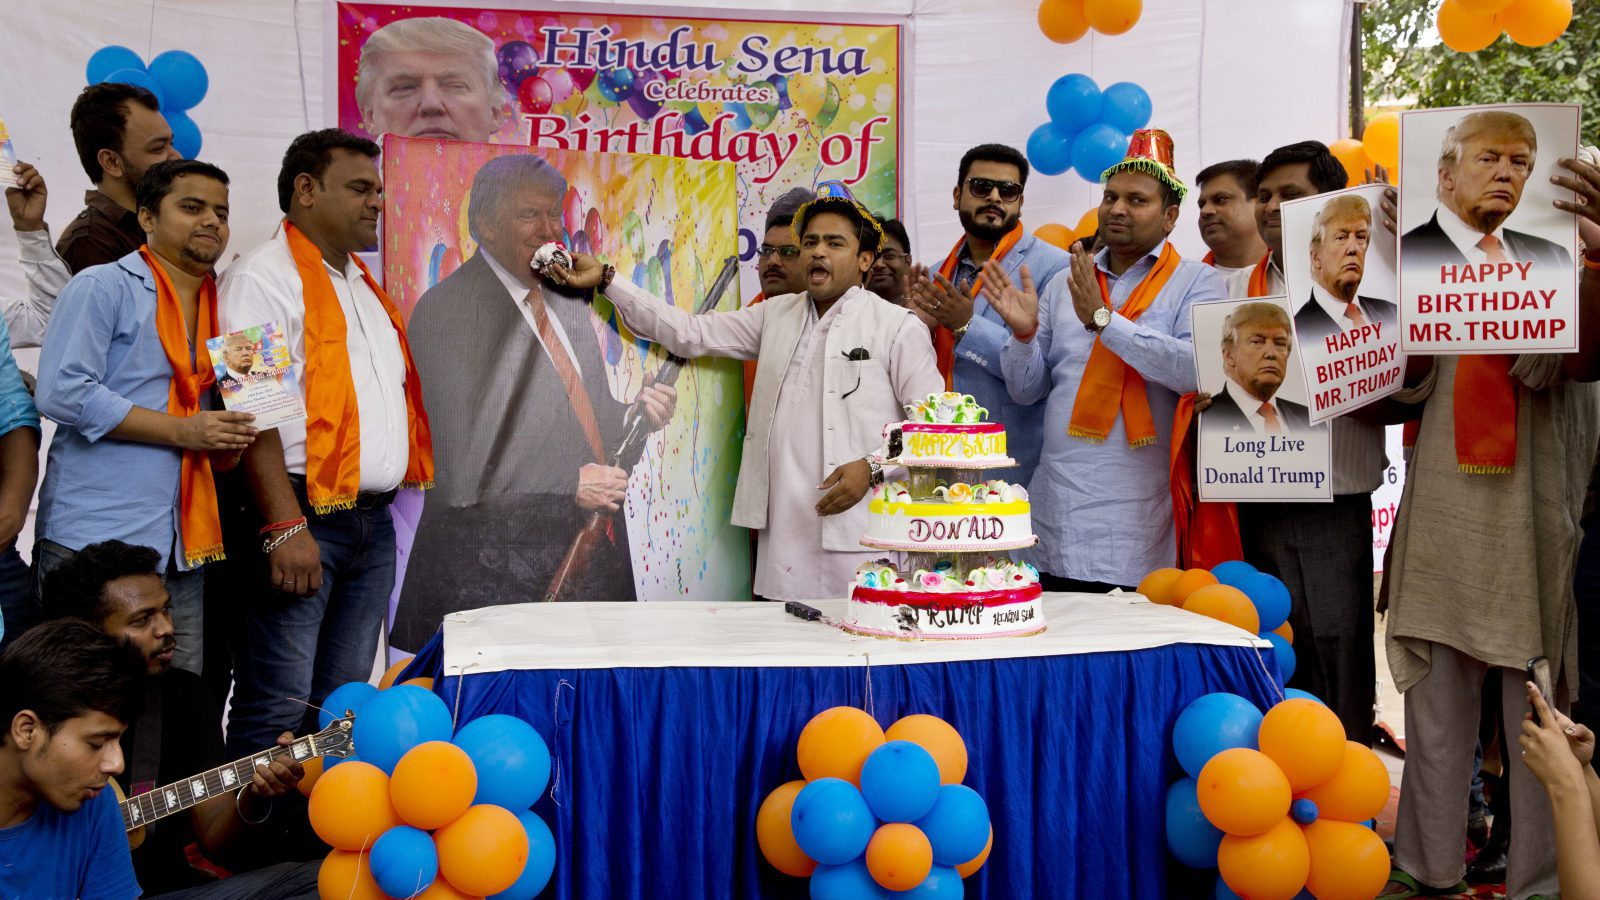 Members of Hindu nationalist party 'Hindu Sena' or Hindu Army, celebrate the birthday of U.S. presidential candidate Donald Trump in New Delhi, India, Tuesday, June 14, 2016.